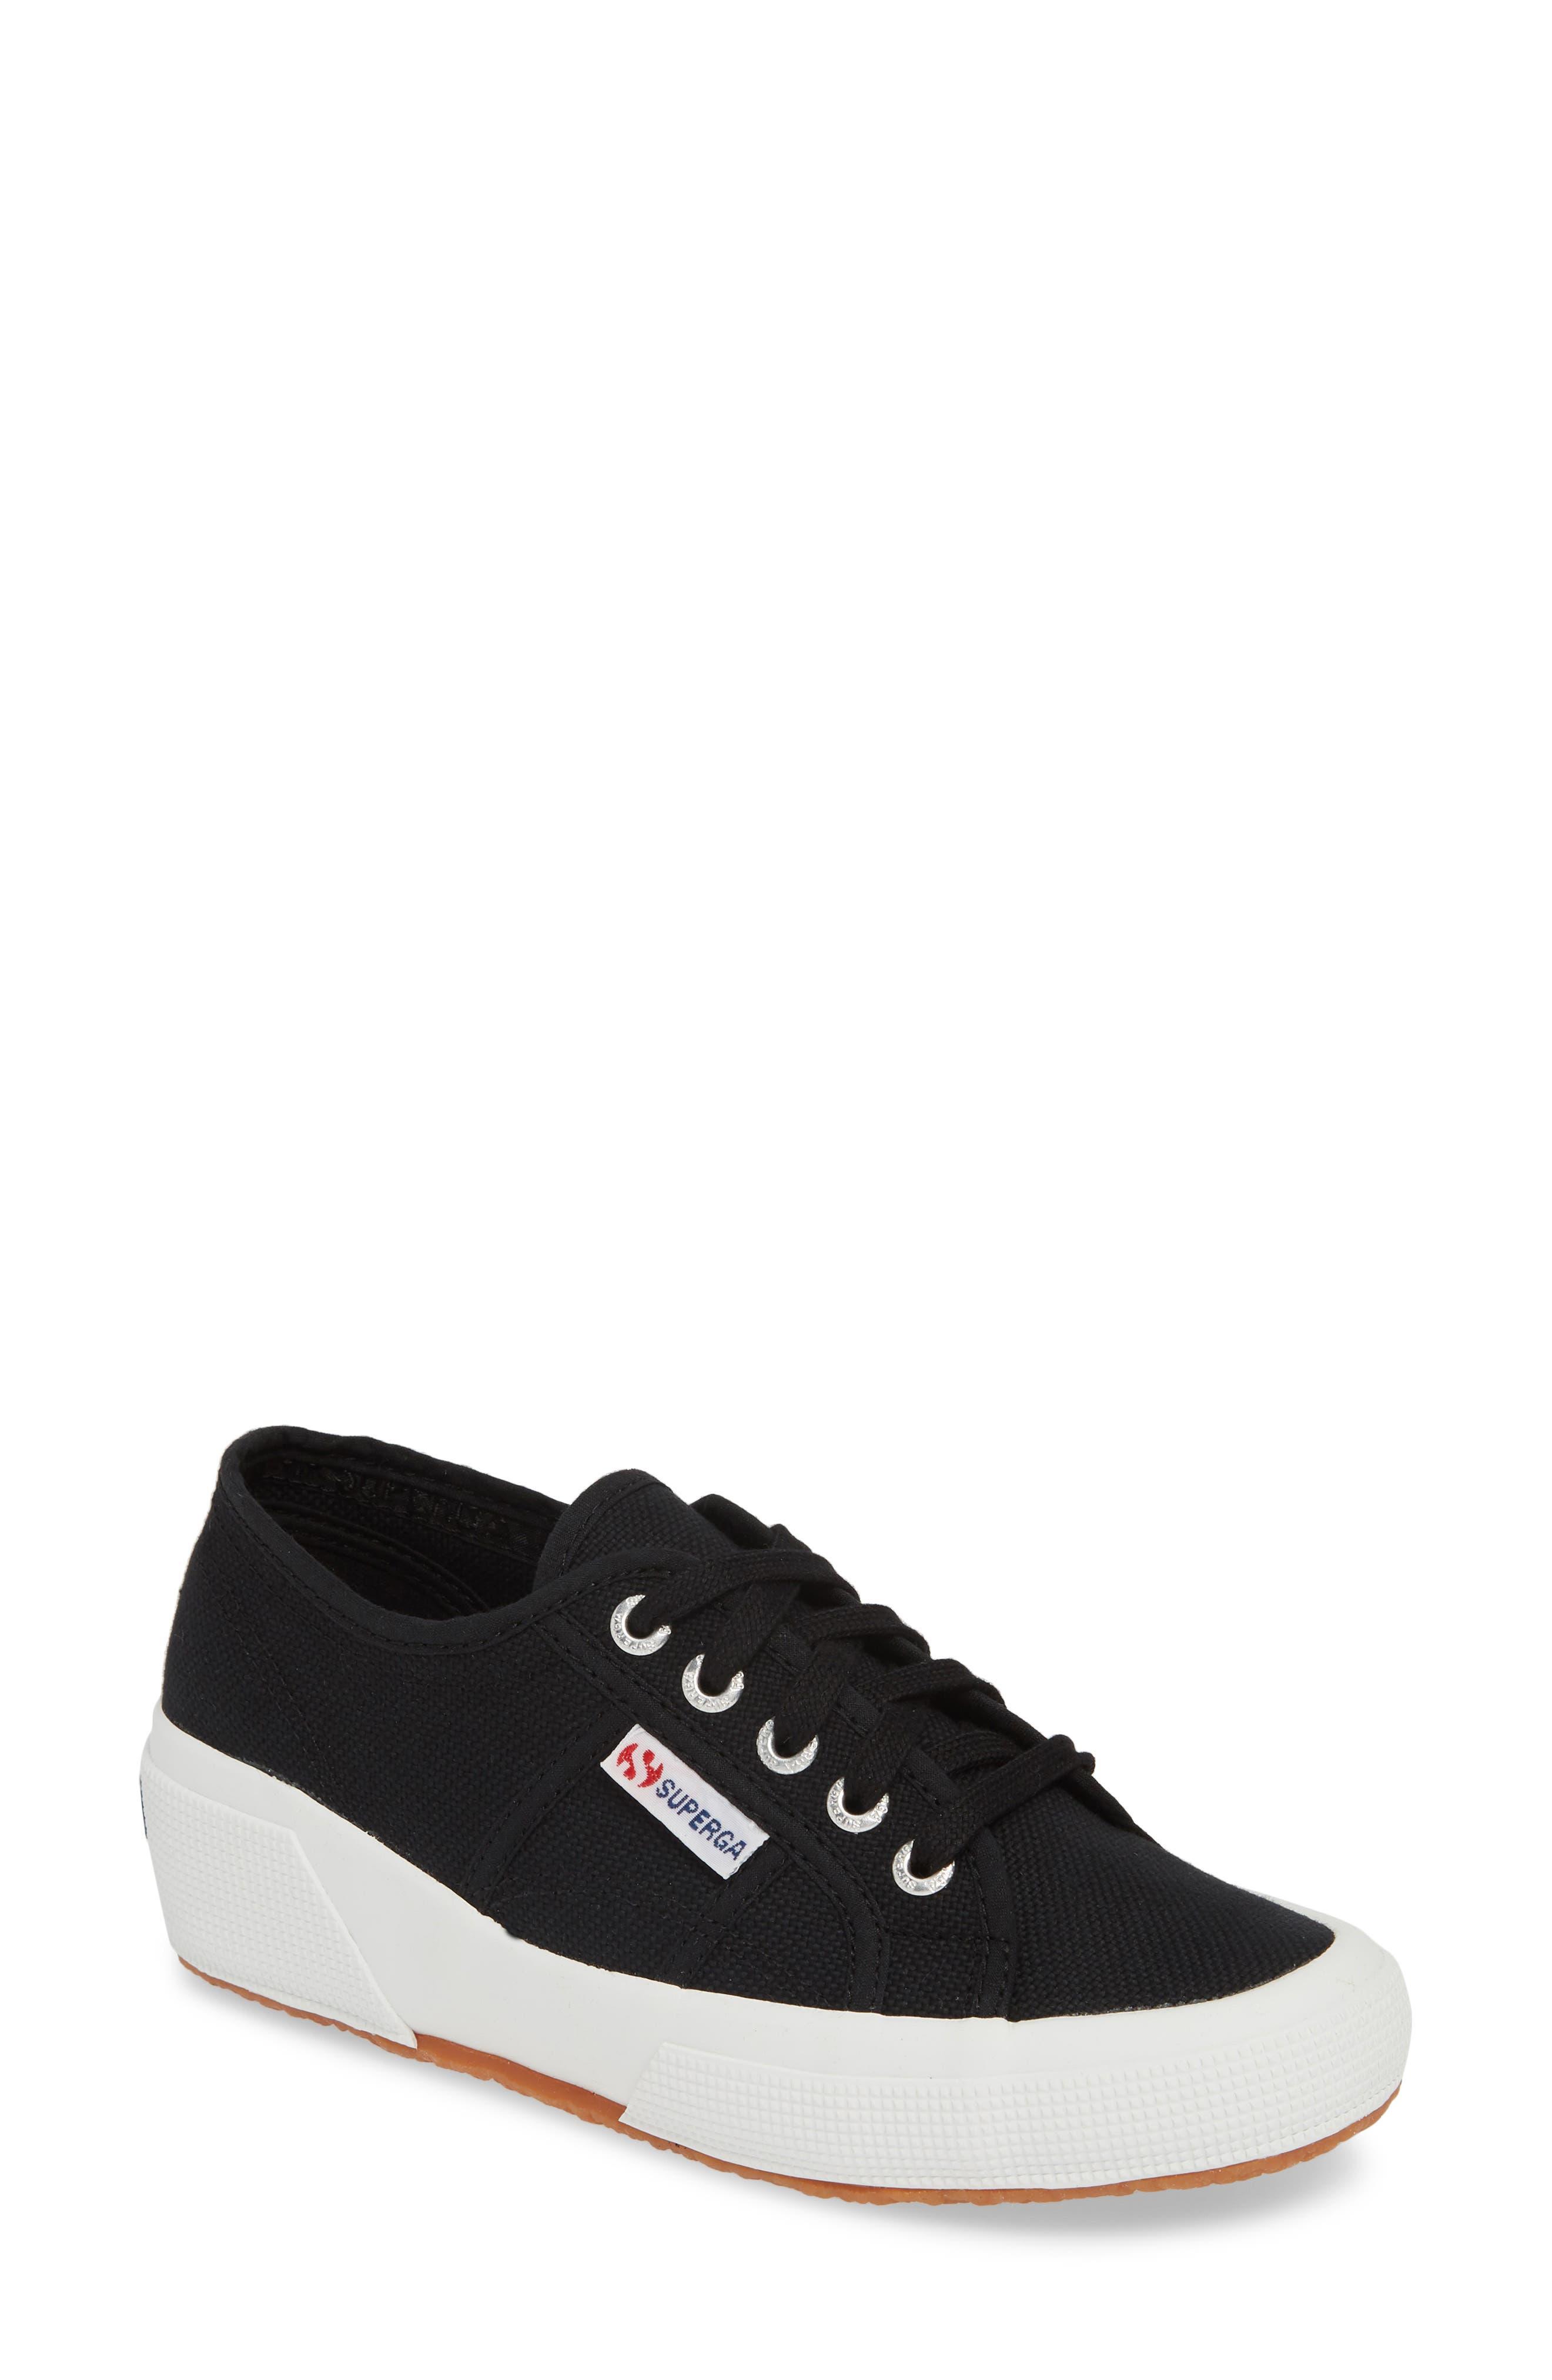 Superga 'Linea' Wedge Sneaker (Women